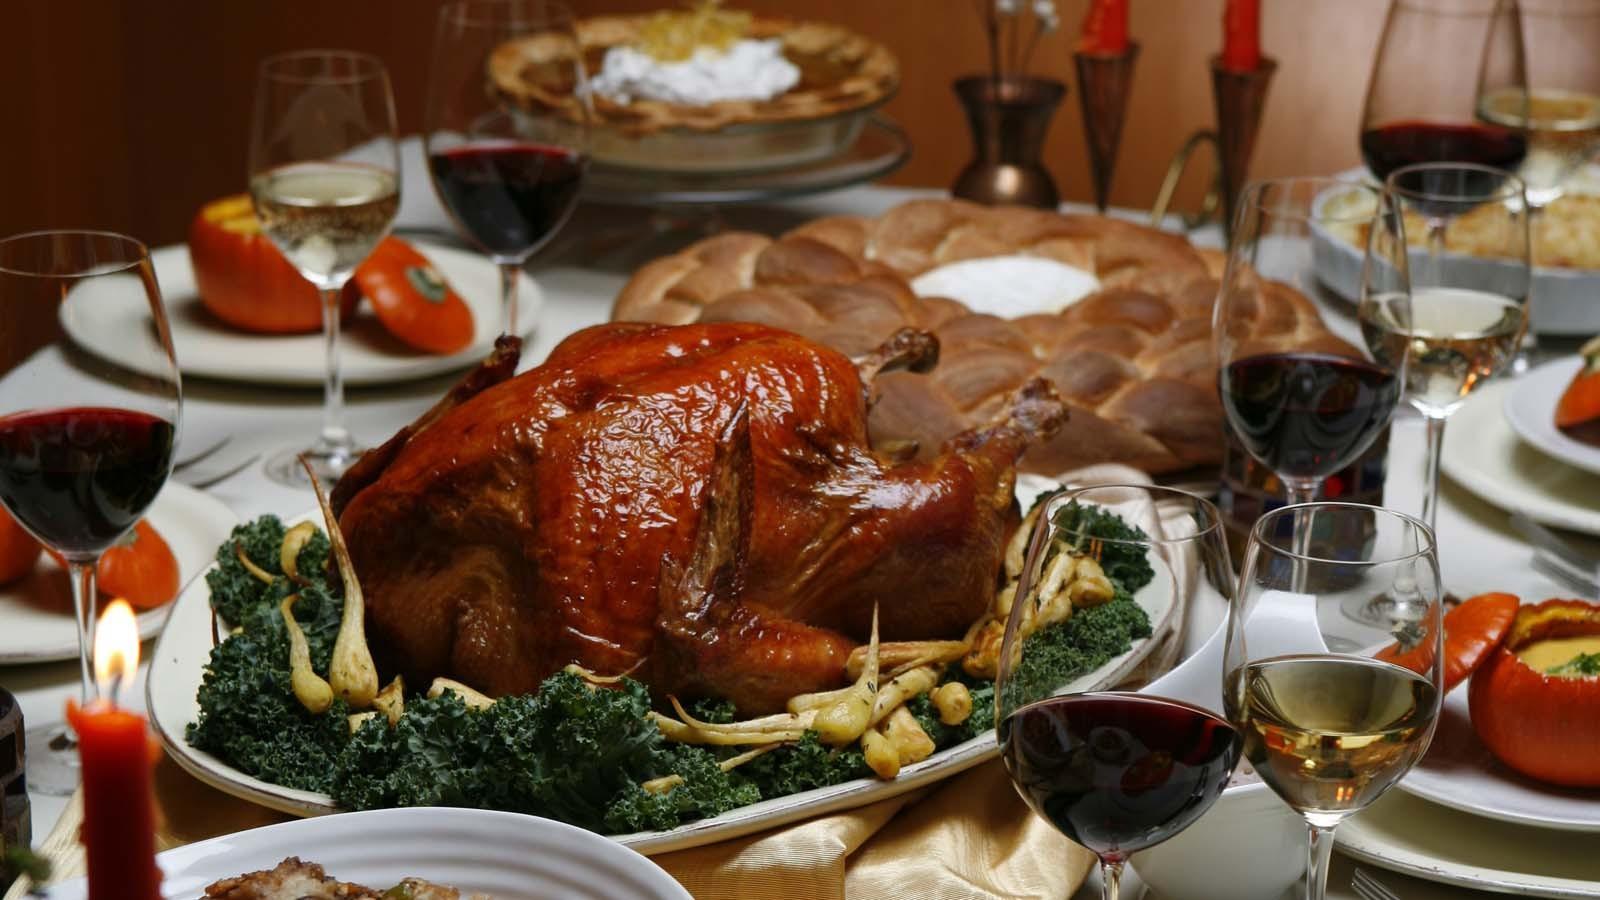 thanksgiving - photo #24